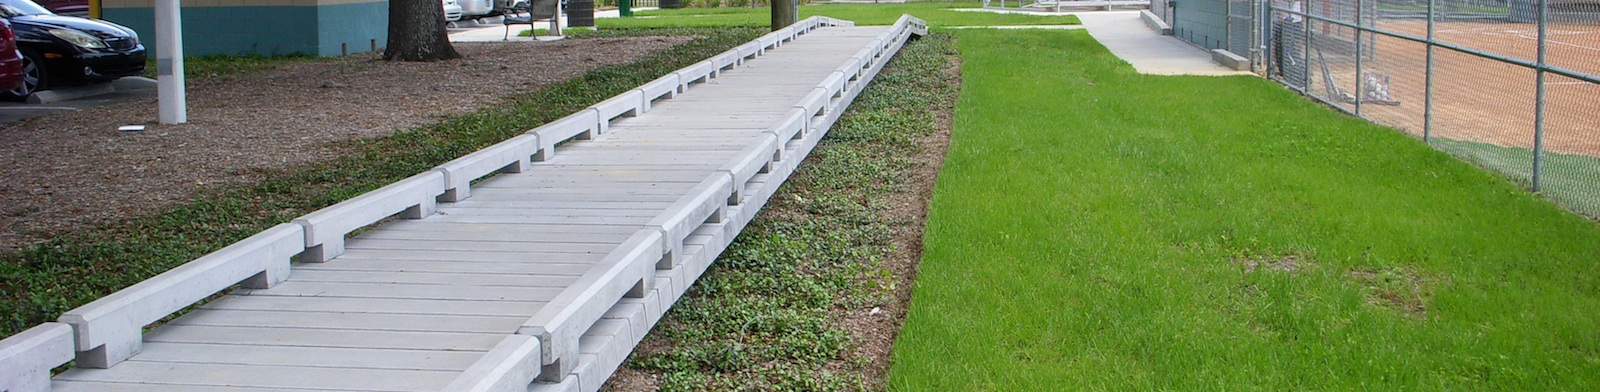 Springhill_Tampa_FL_Concrete_Boardwalk_-_Urban_Walkway.jpg